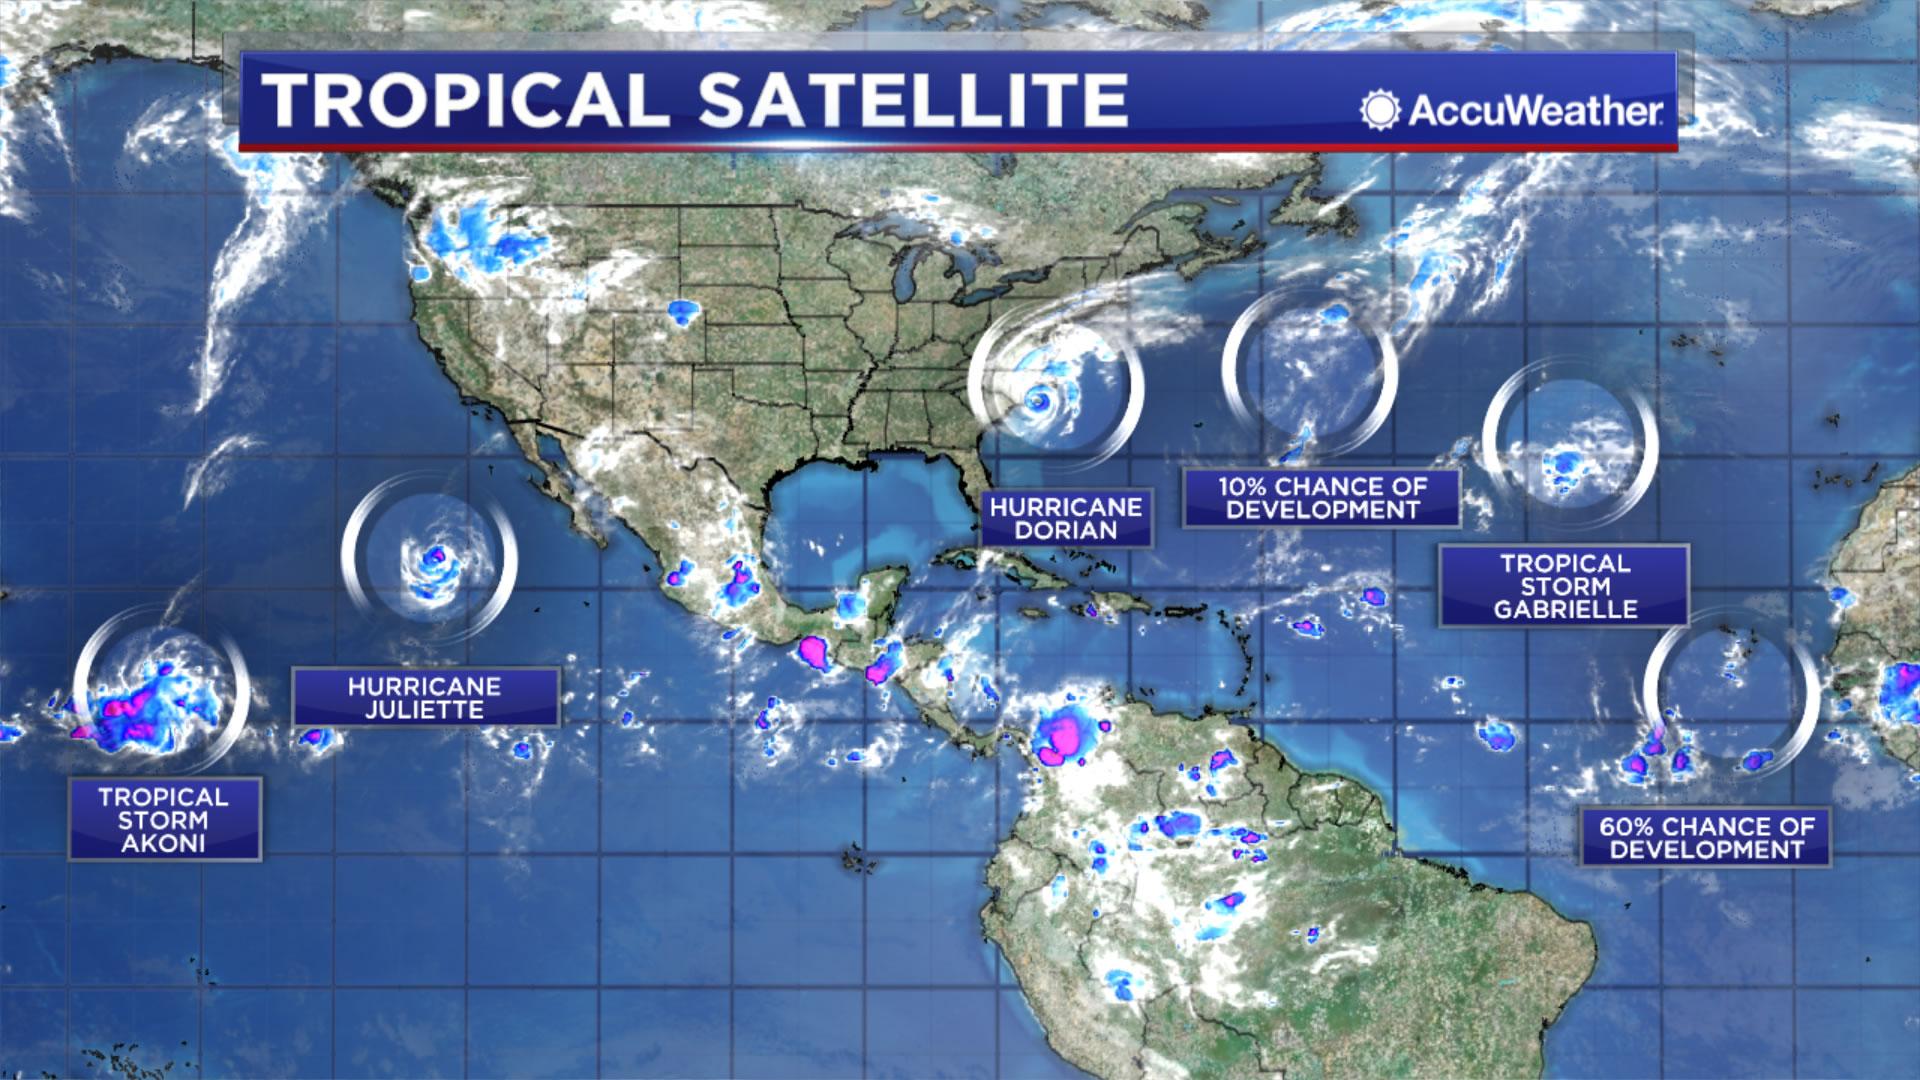 Hurricane Dorian makes landfall over North Carolina's Outer Banks